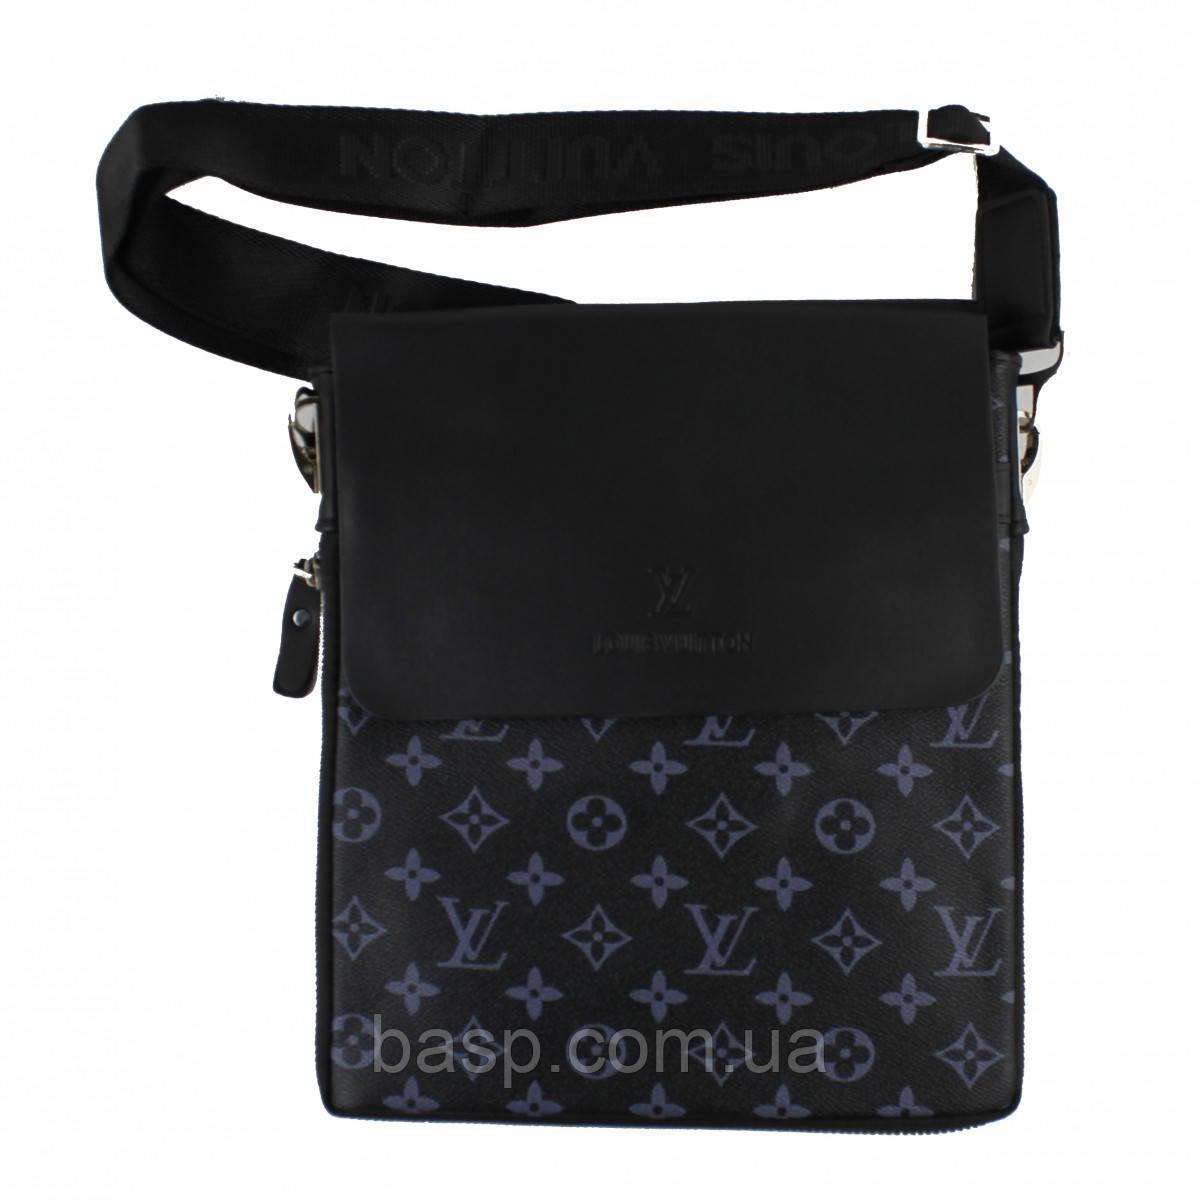 beaf97cb7f43 Мужская сумка планшет Louis Vuitton(реплика) - интернет-магазин